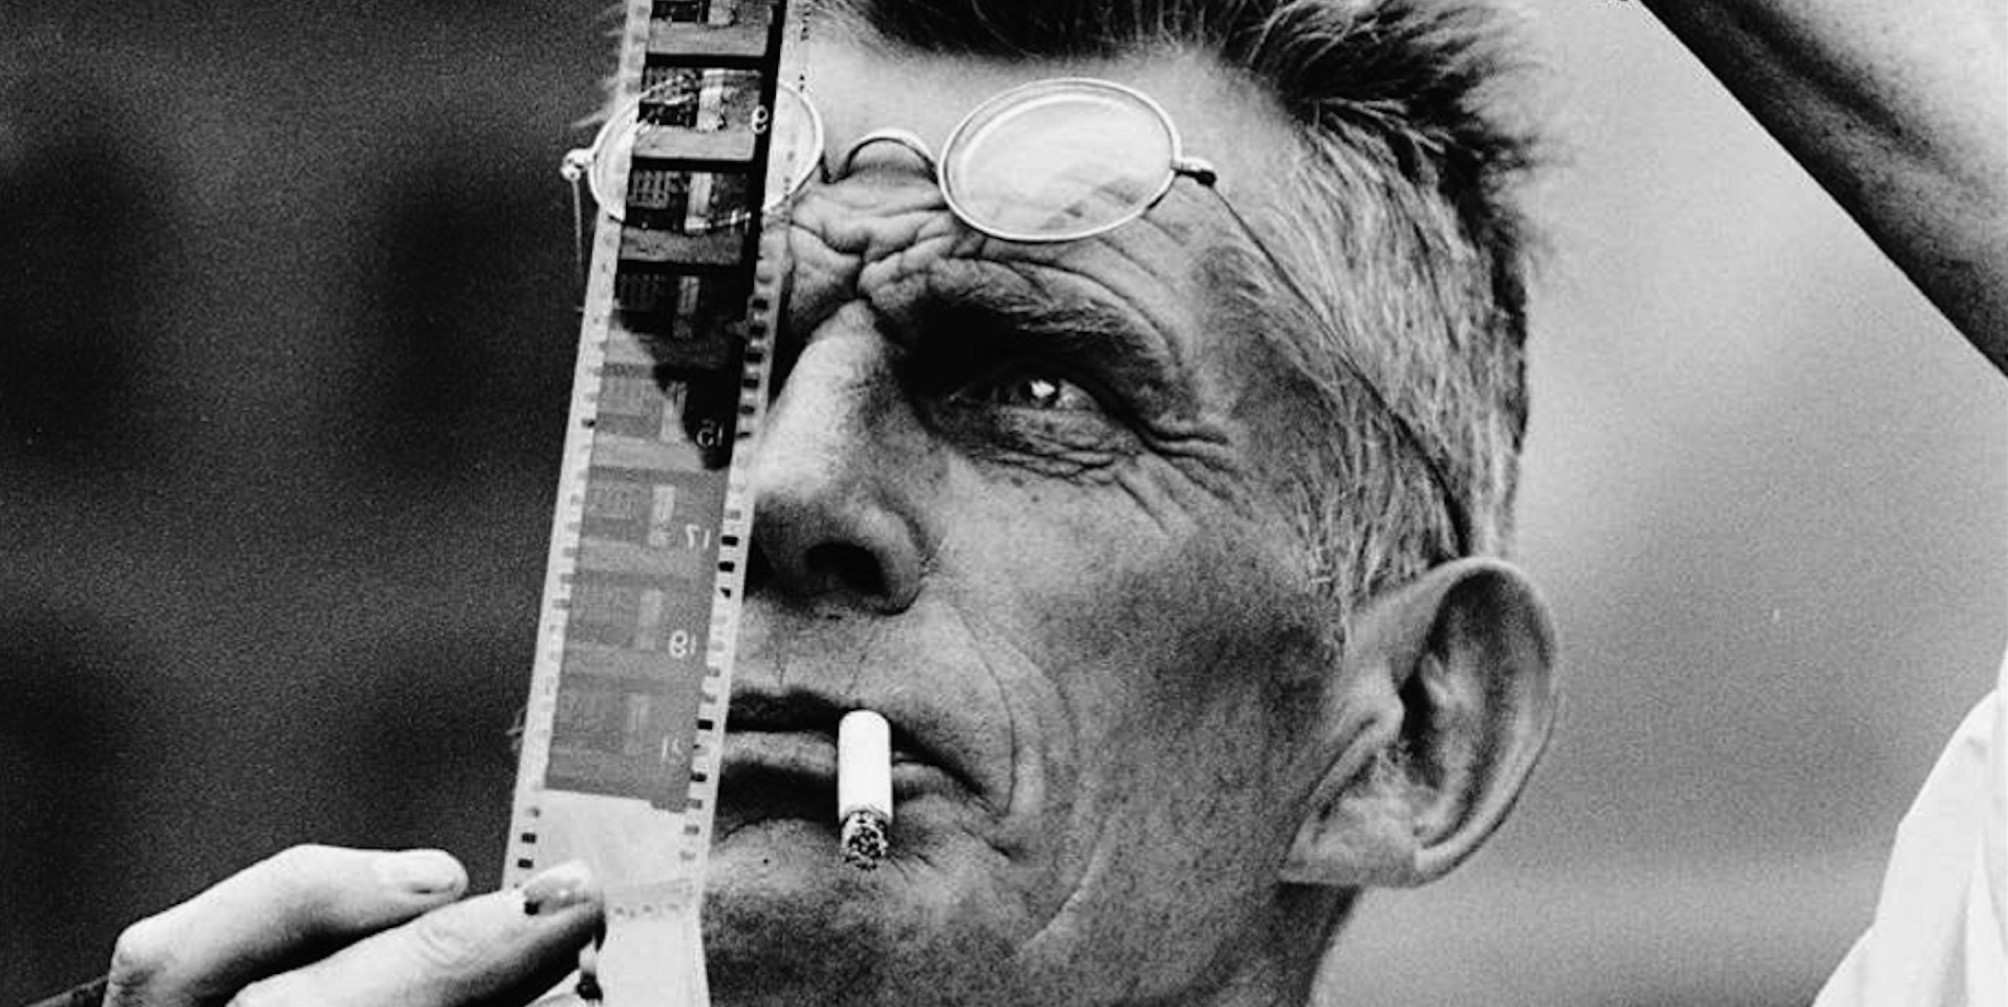 beckett-with-film-strip-copy